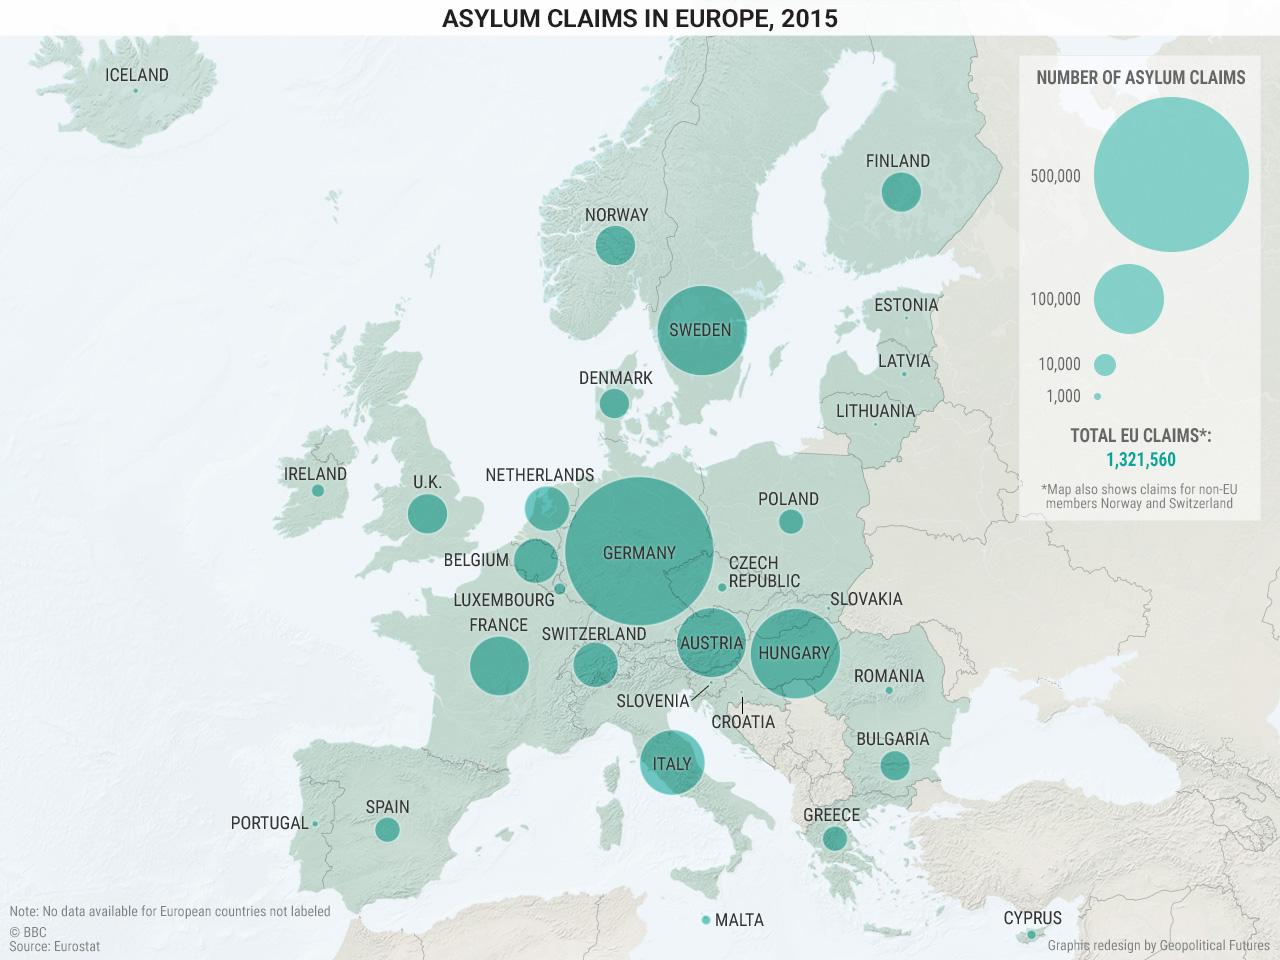 Asylum Claims in Europe, 2015